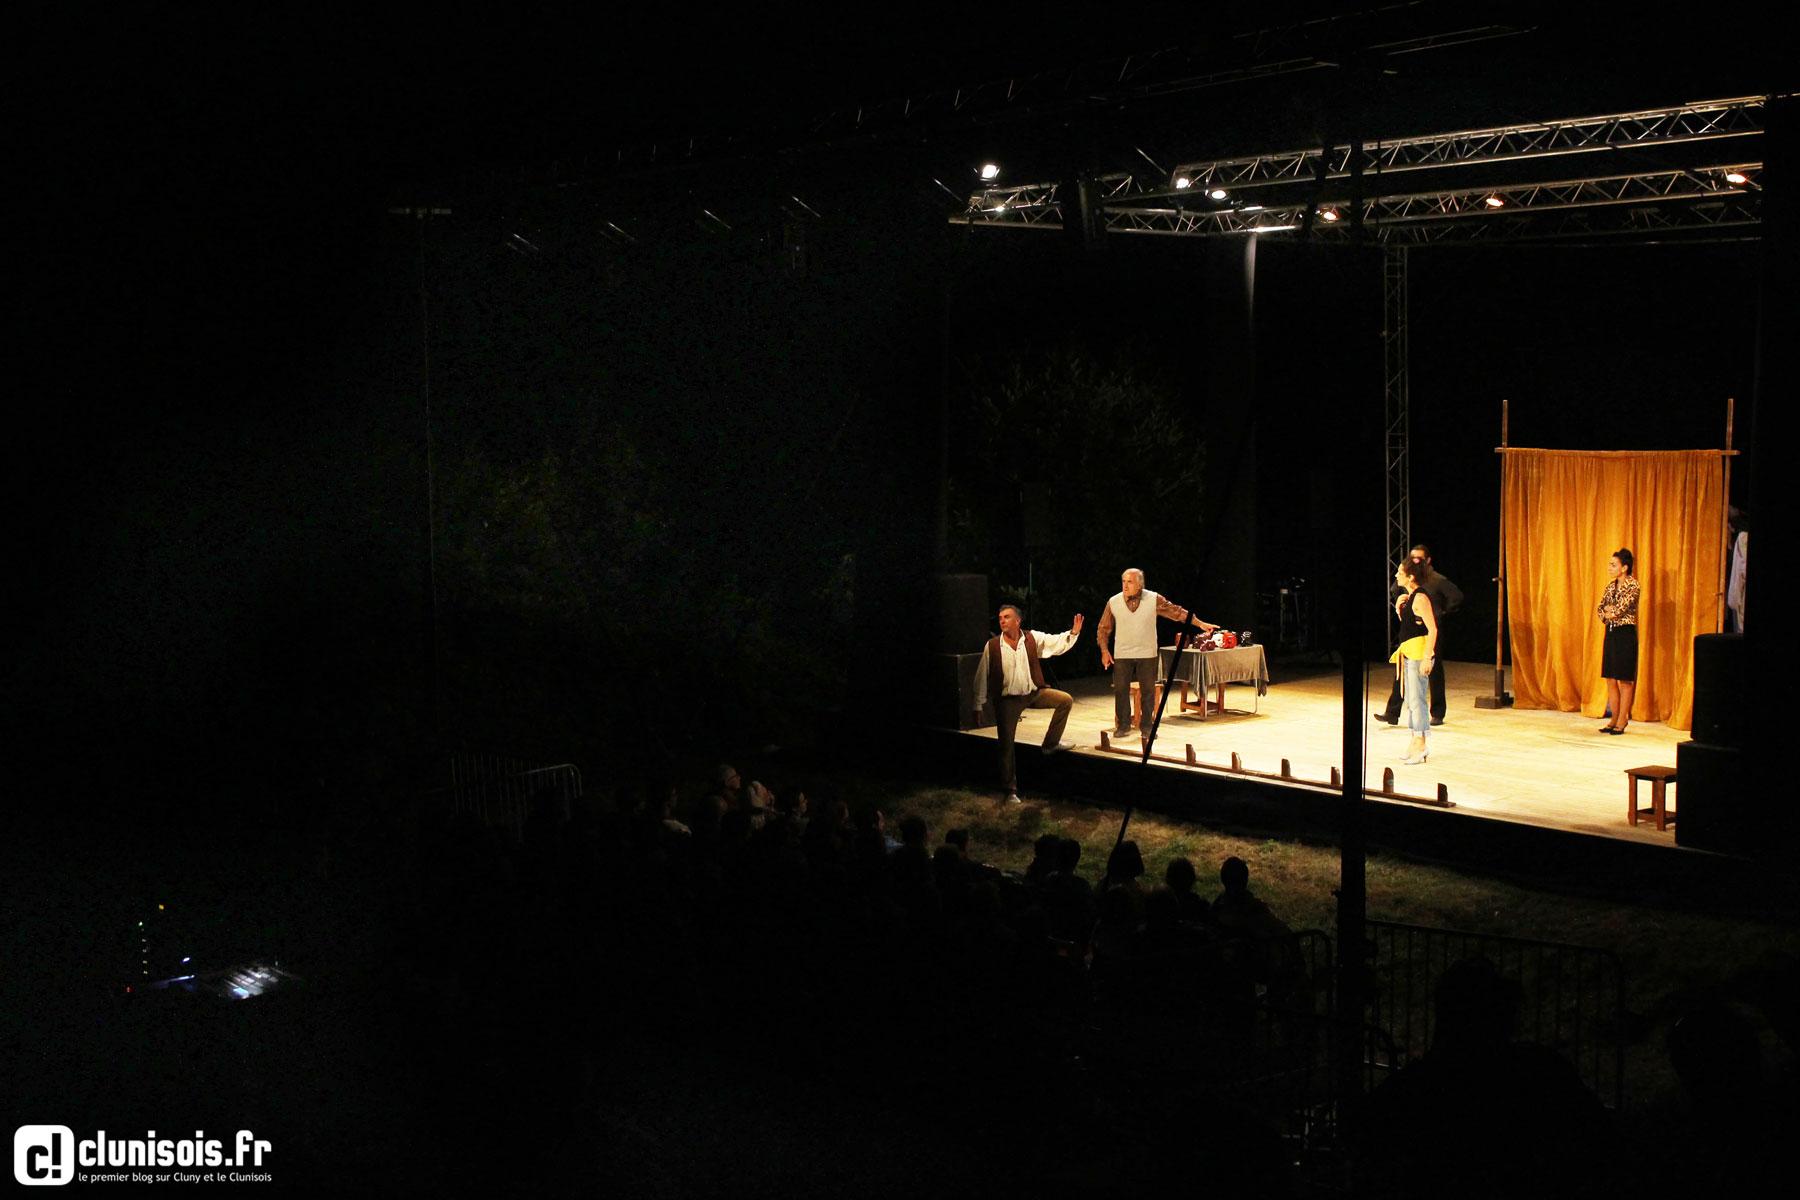 festival-lournand-2016-photo-clunisoisfr-14